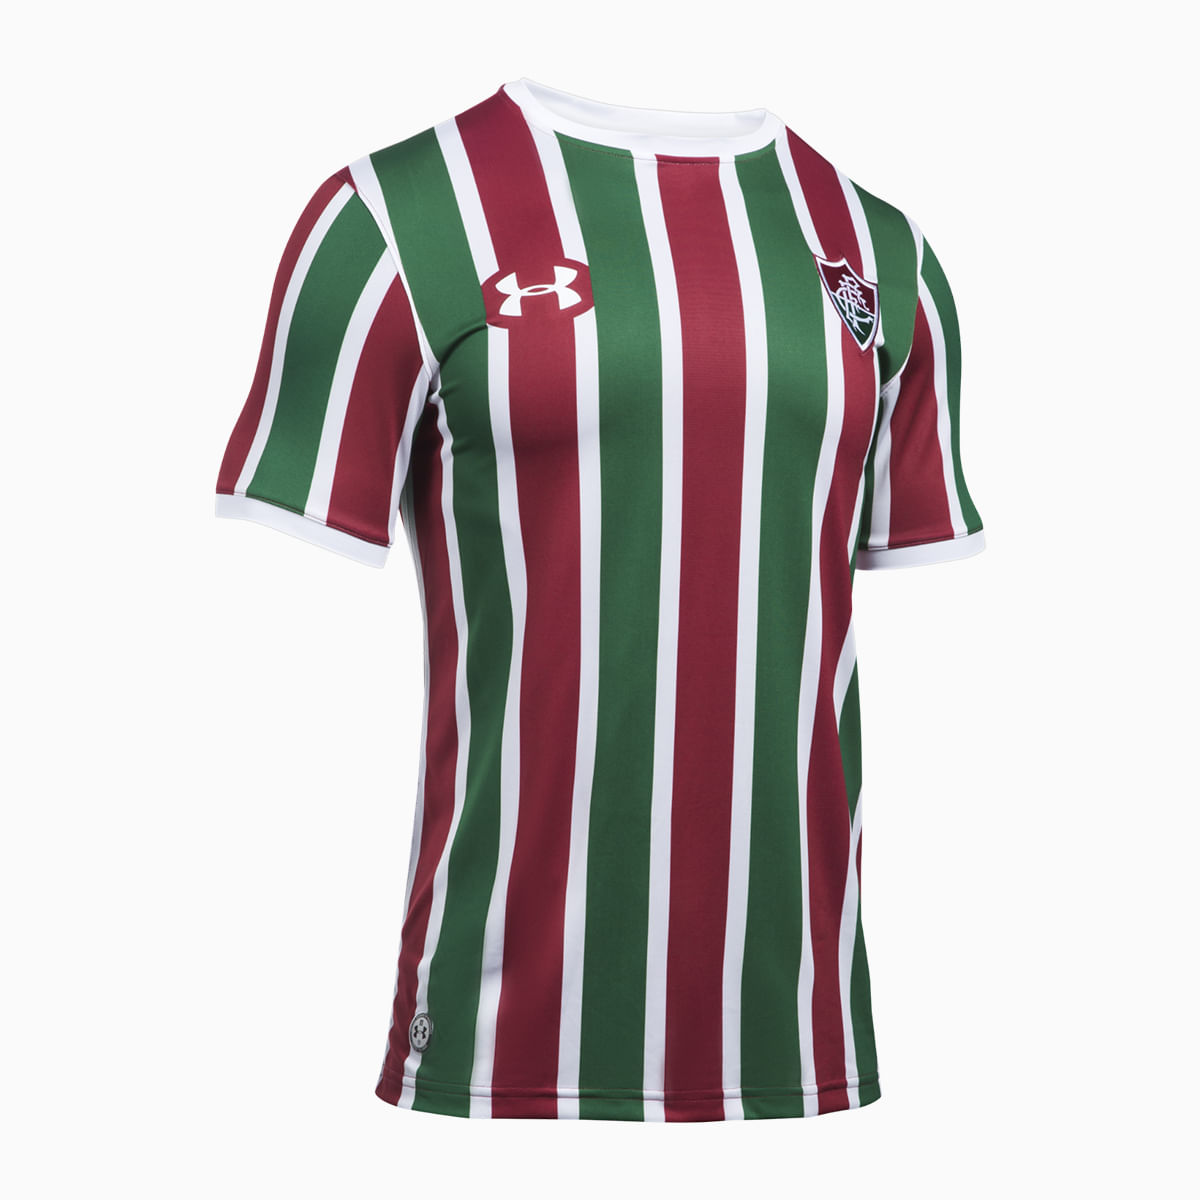 Camisa Fluminense I 17 18 s nº Torcedor Under Armour Masculina - fluminense bb43687436a85